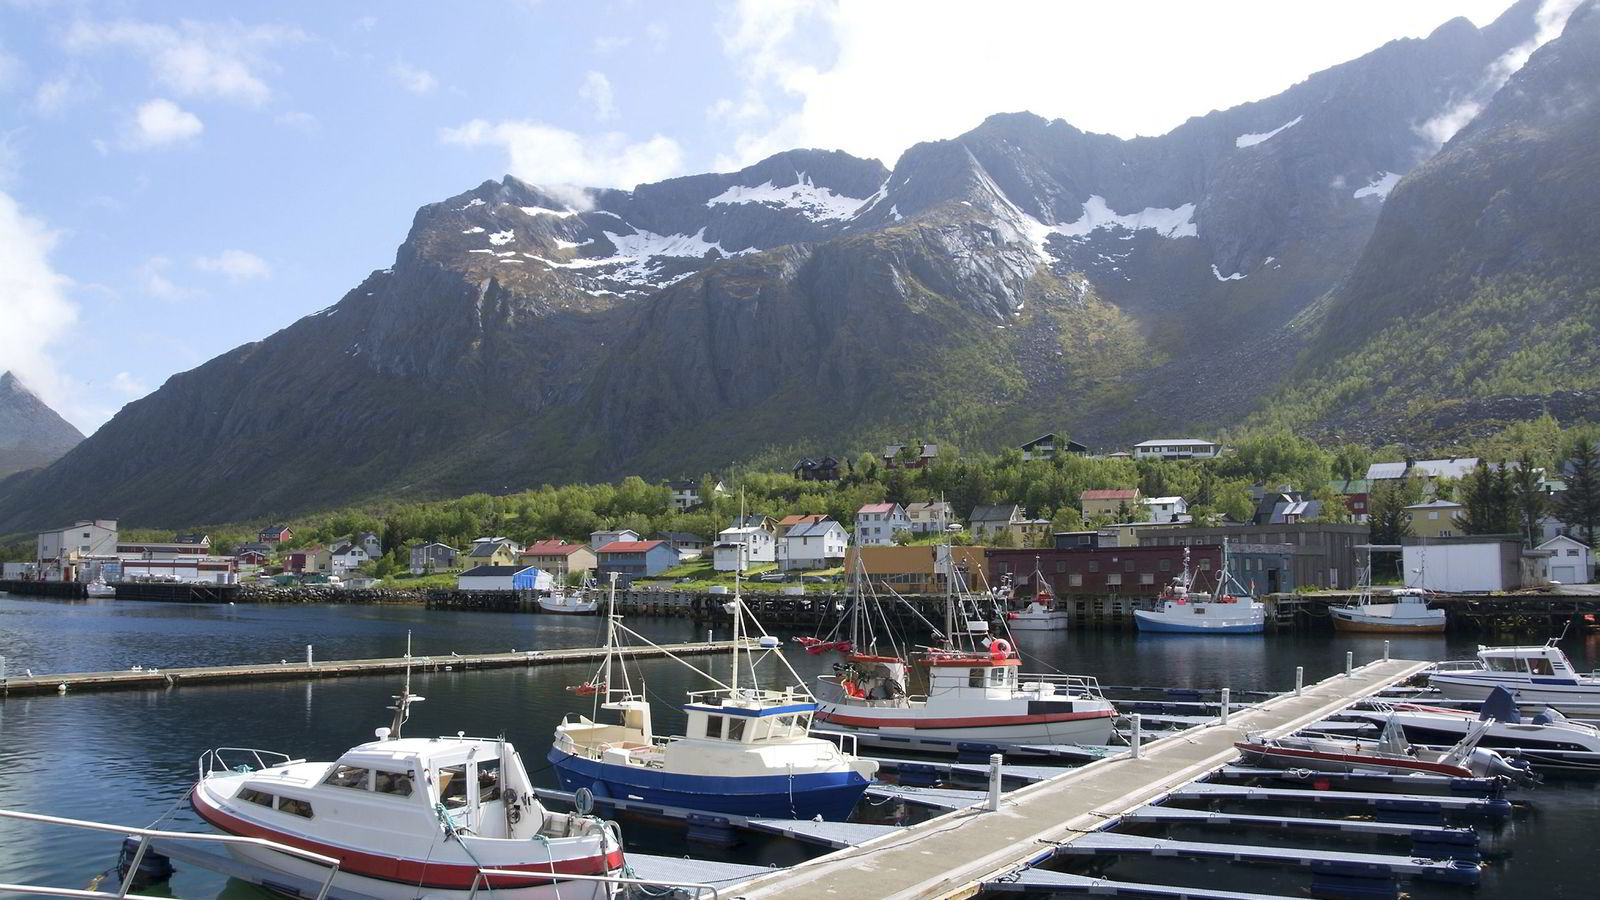 Gryllefjord i Torsken kommune i Troms fylke. Foto: Istock